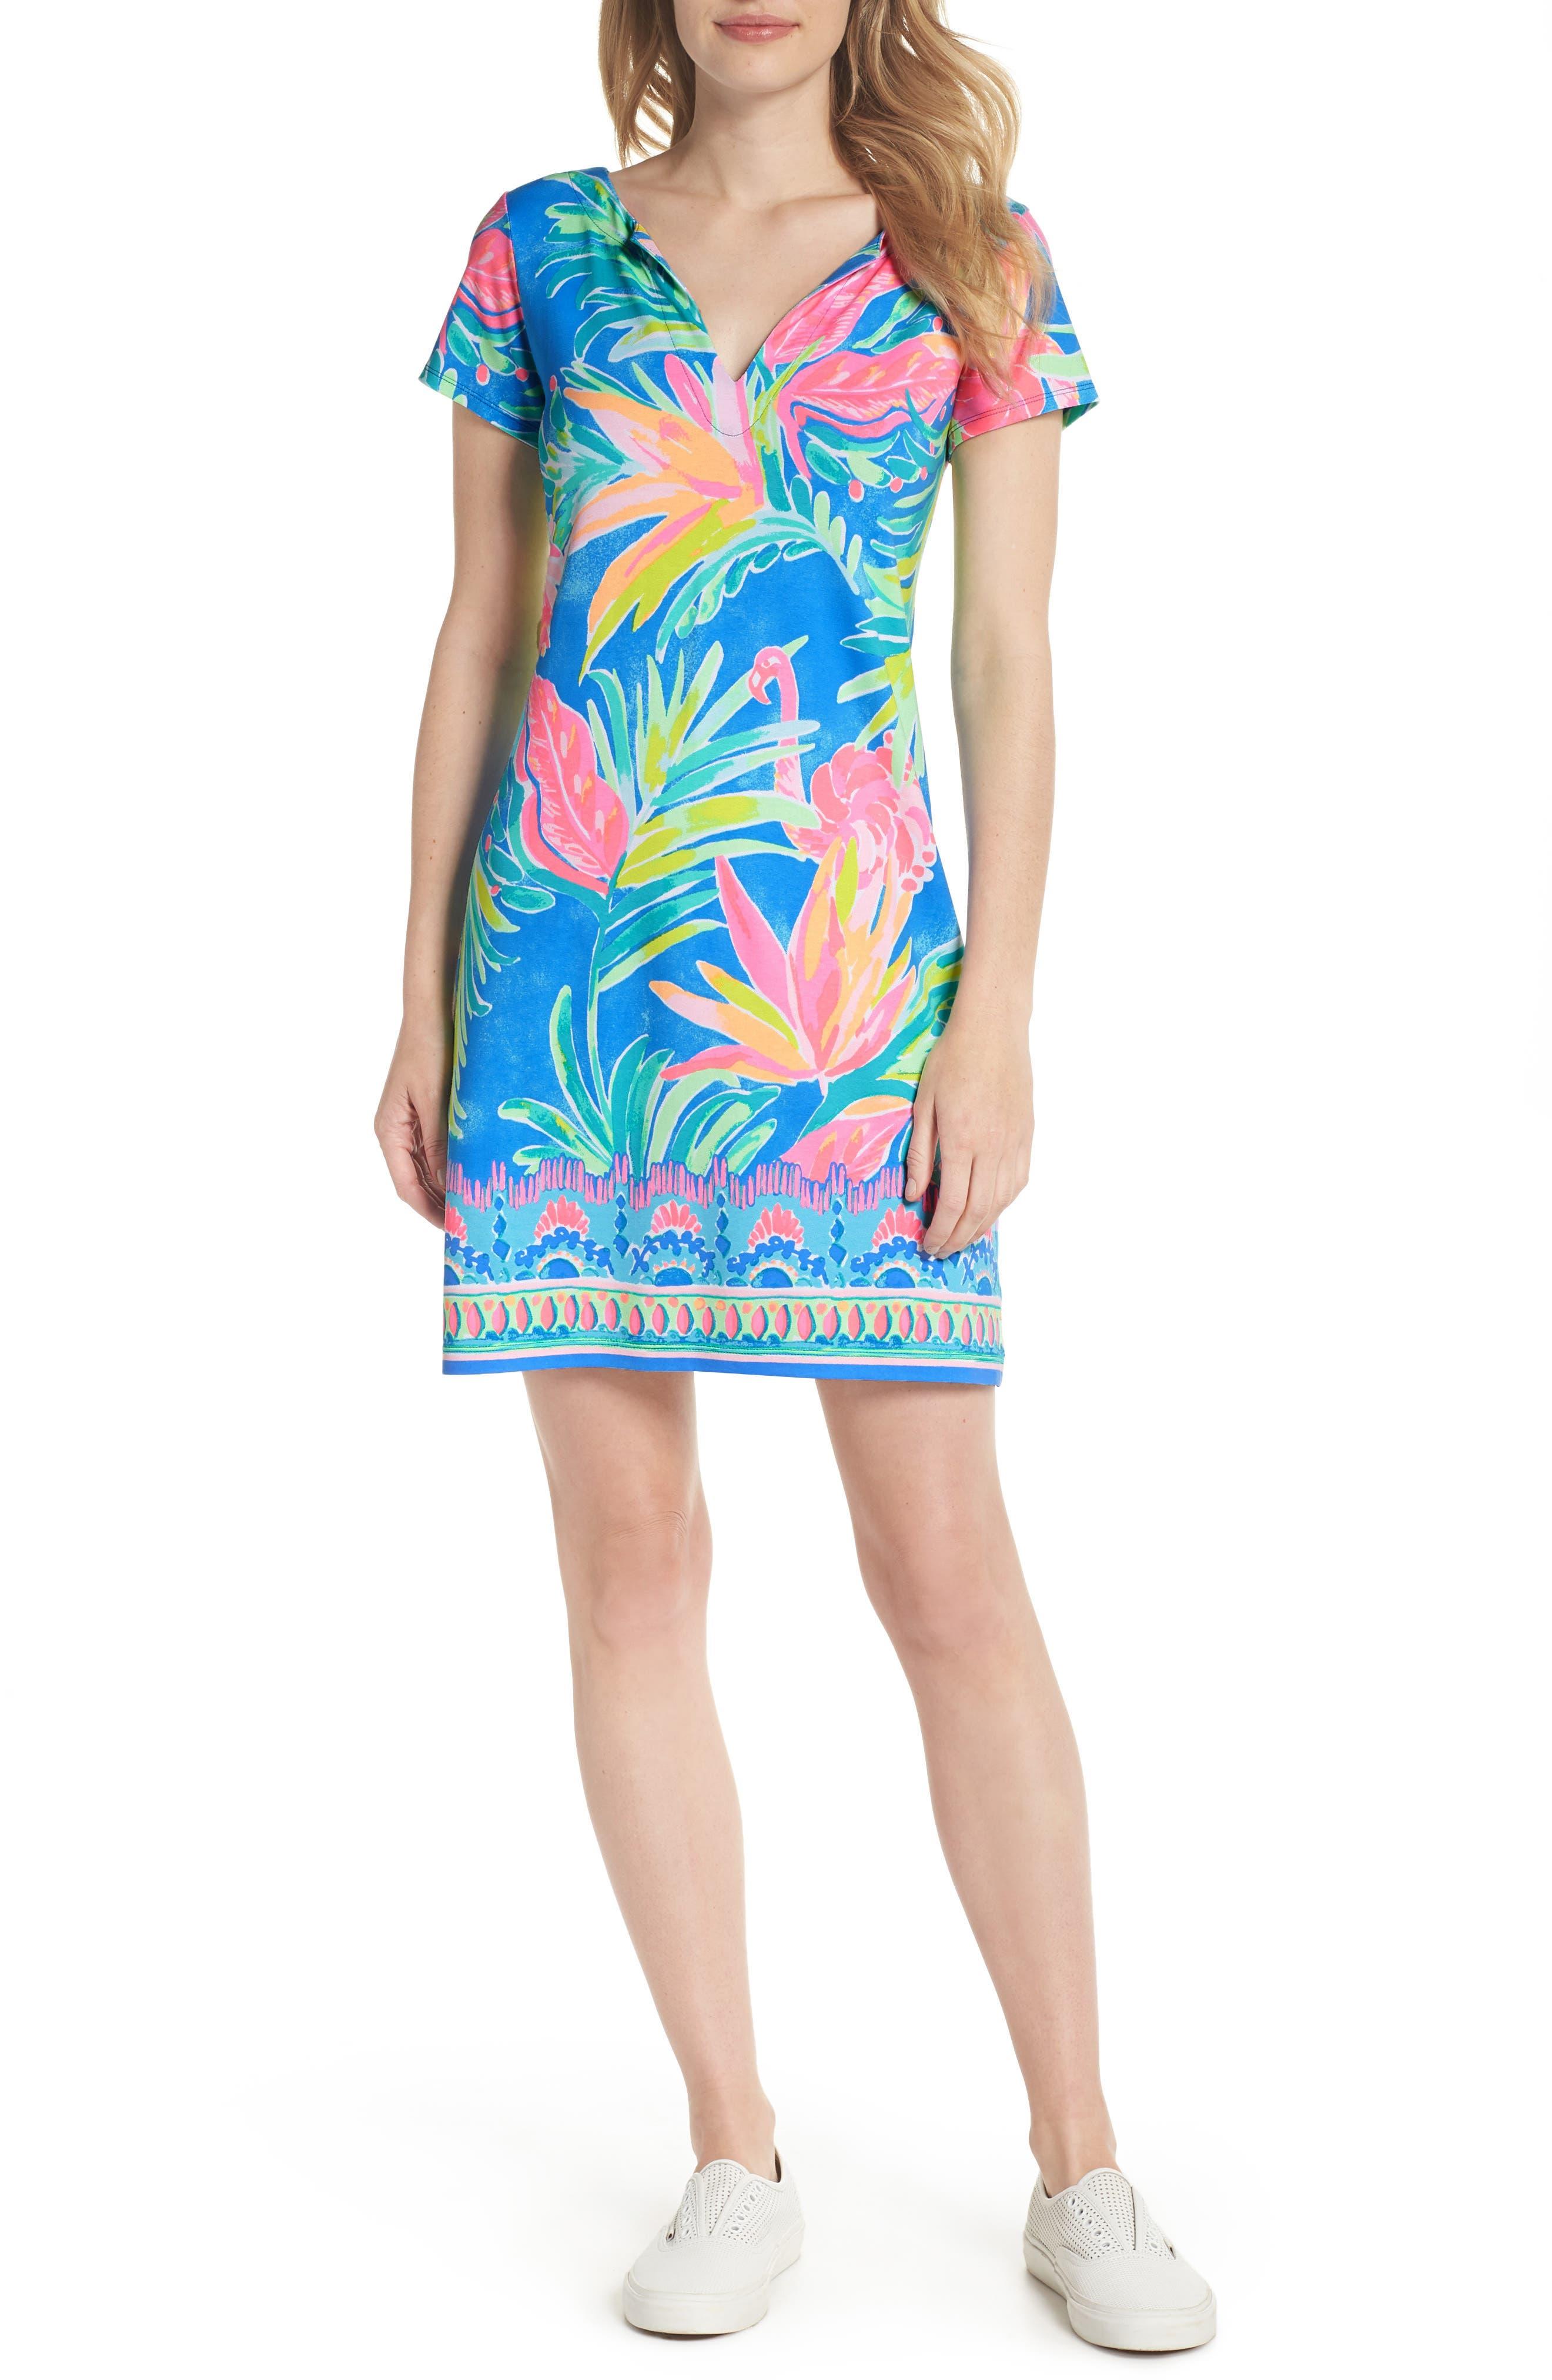 Sophiletta UPF 50+ Dress,                         Main,                         color, 420